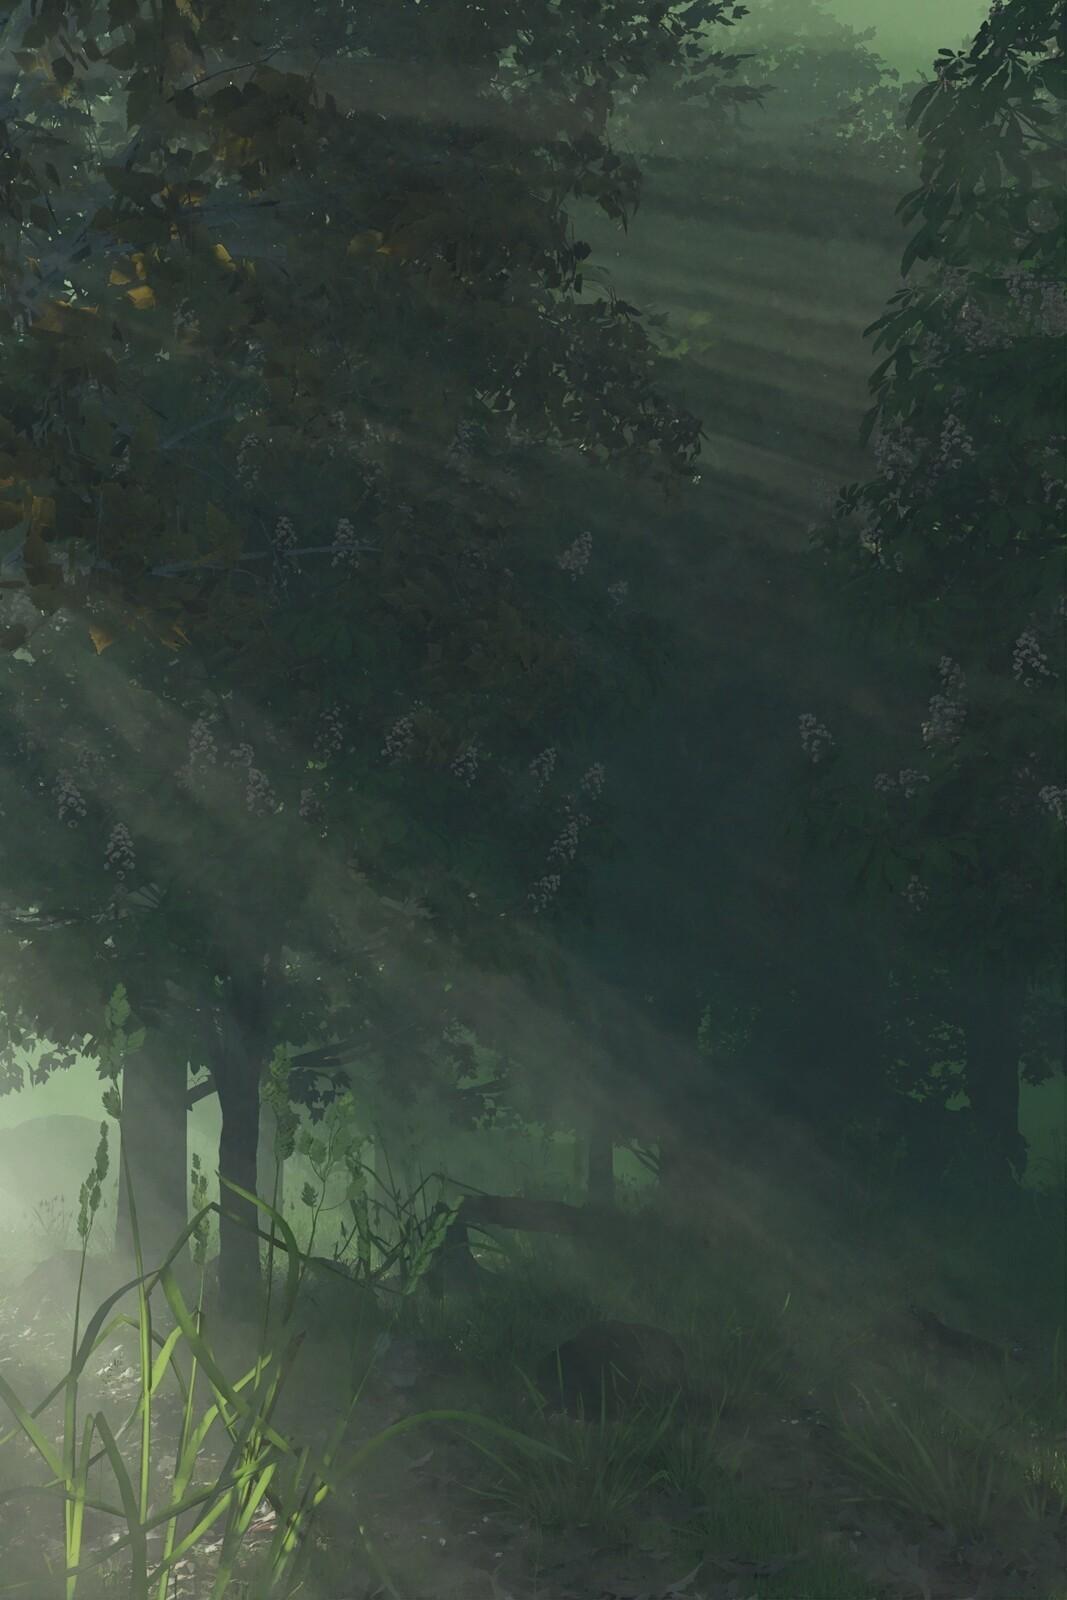 Forest reworked in Fotosketcher